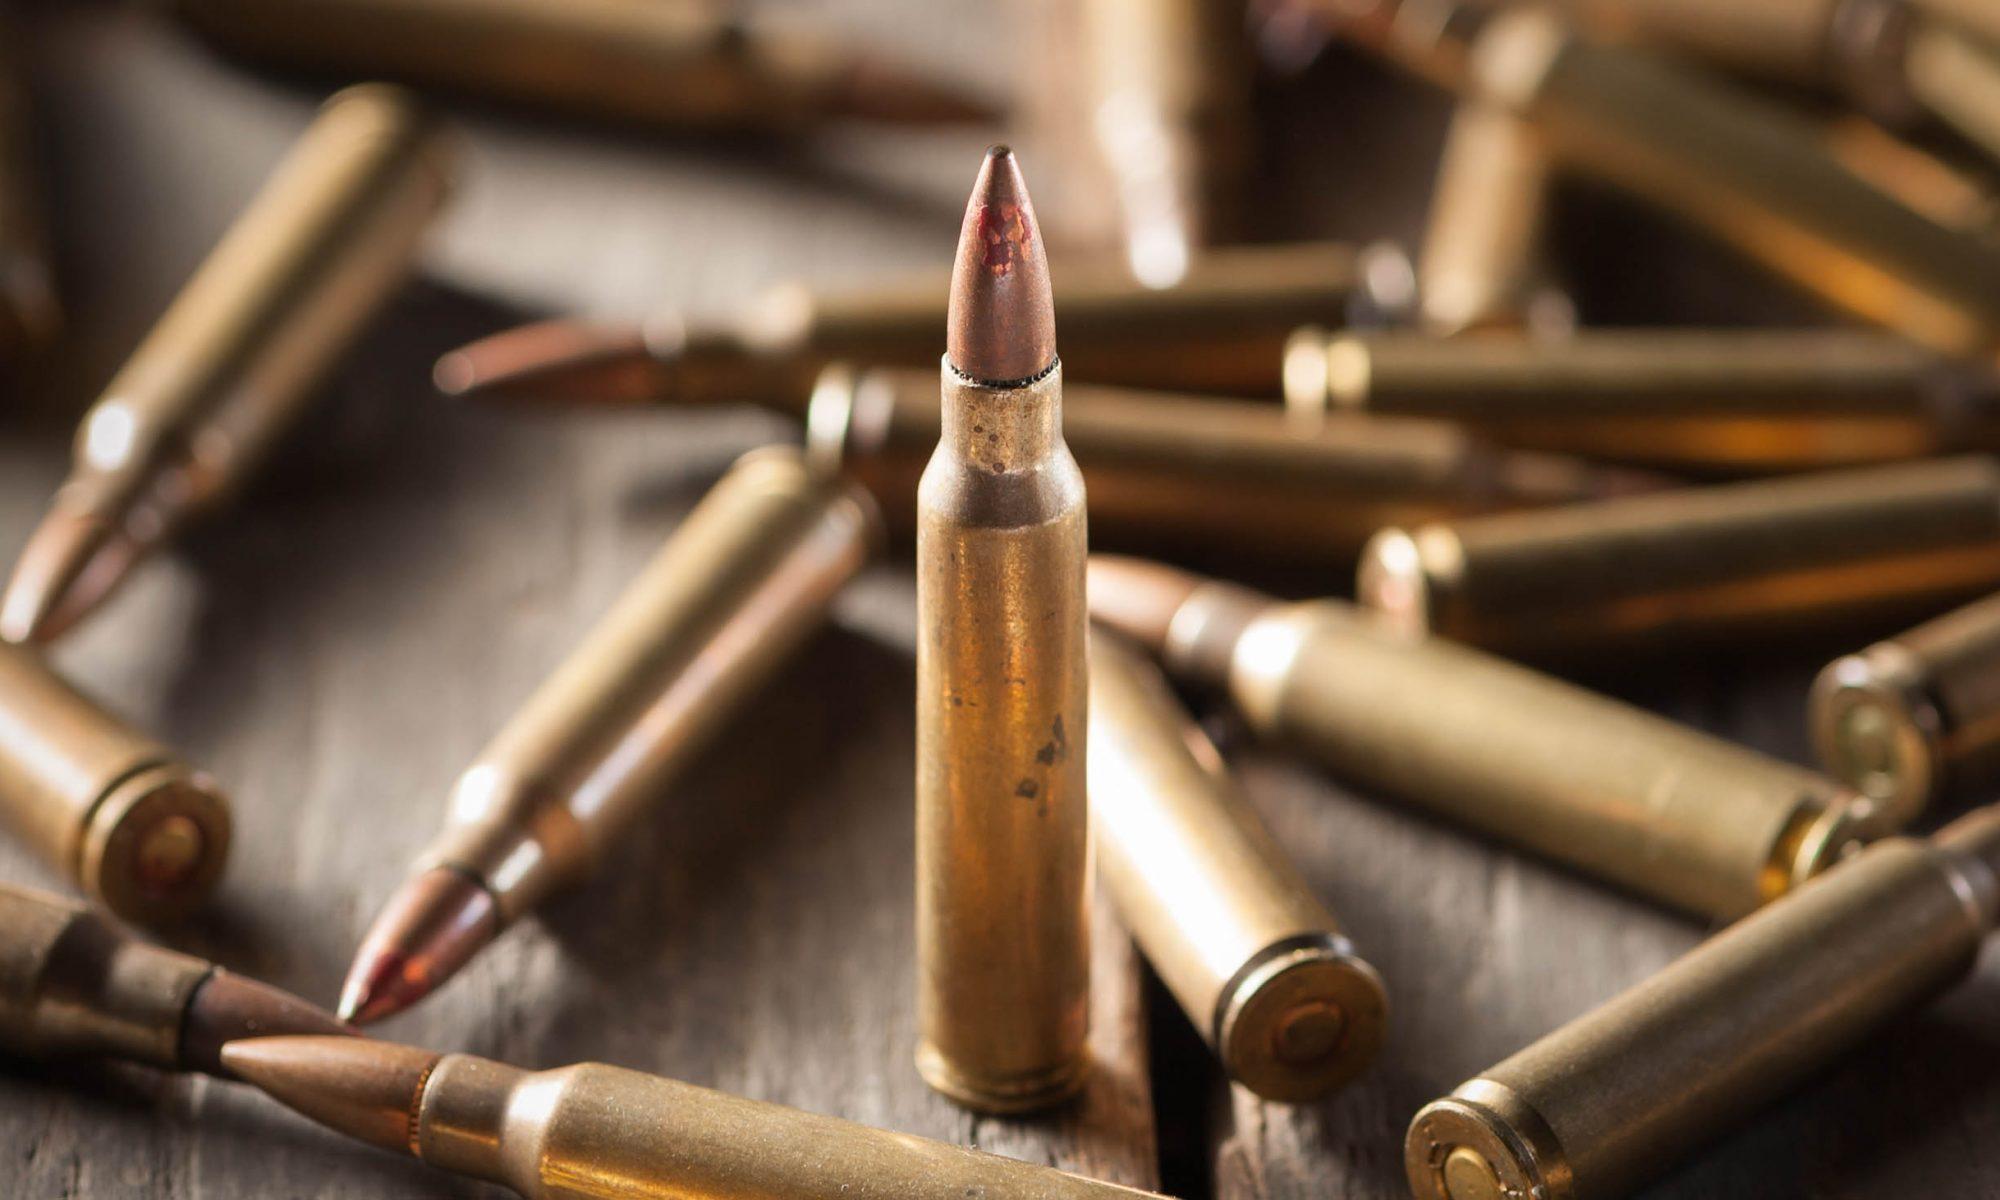 Zbrane, strelivo, montáže na zbrane